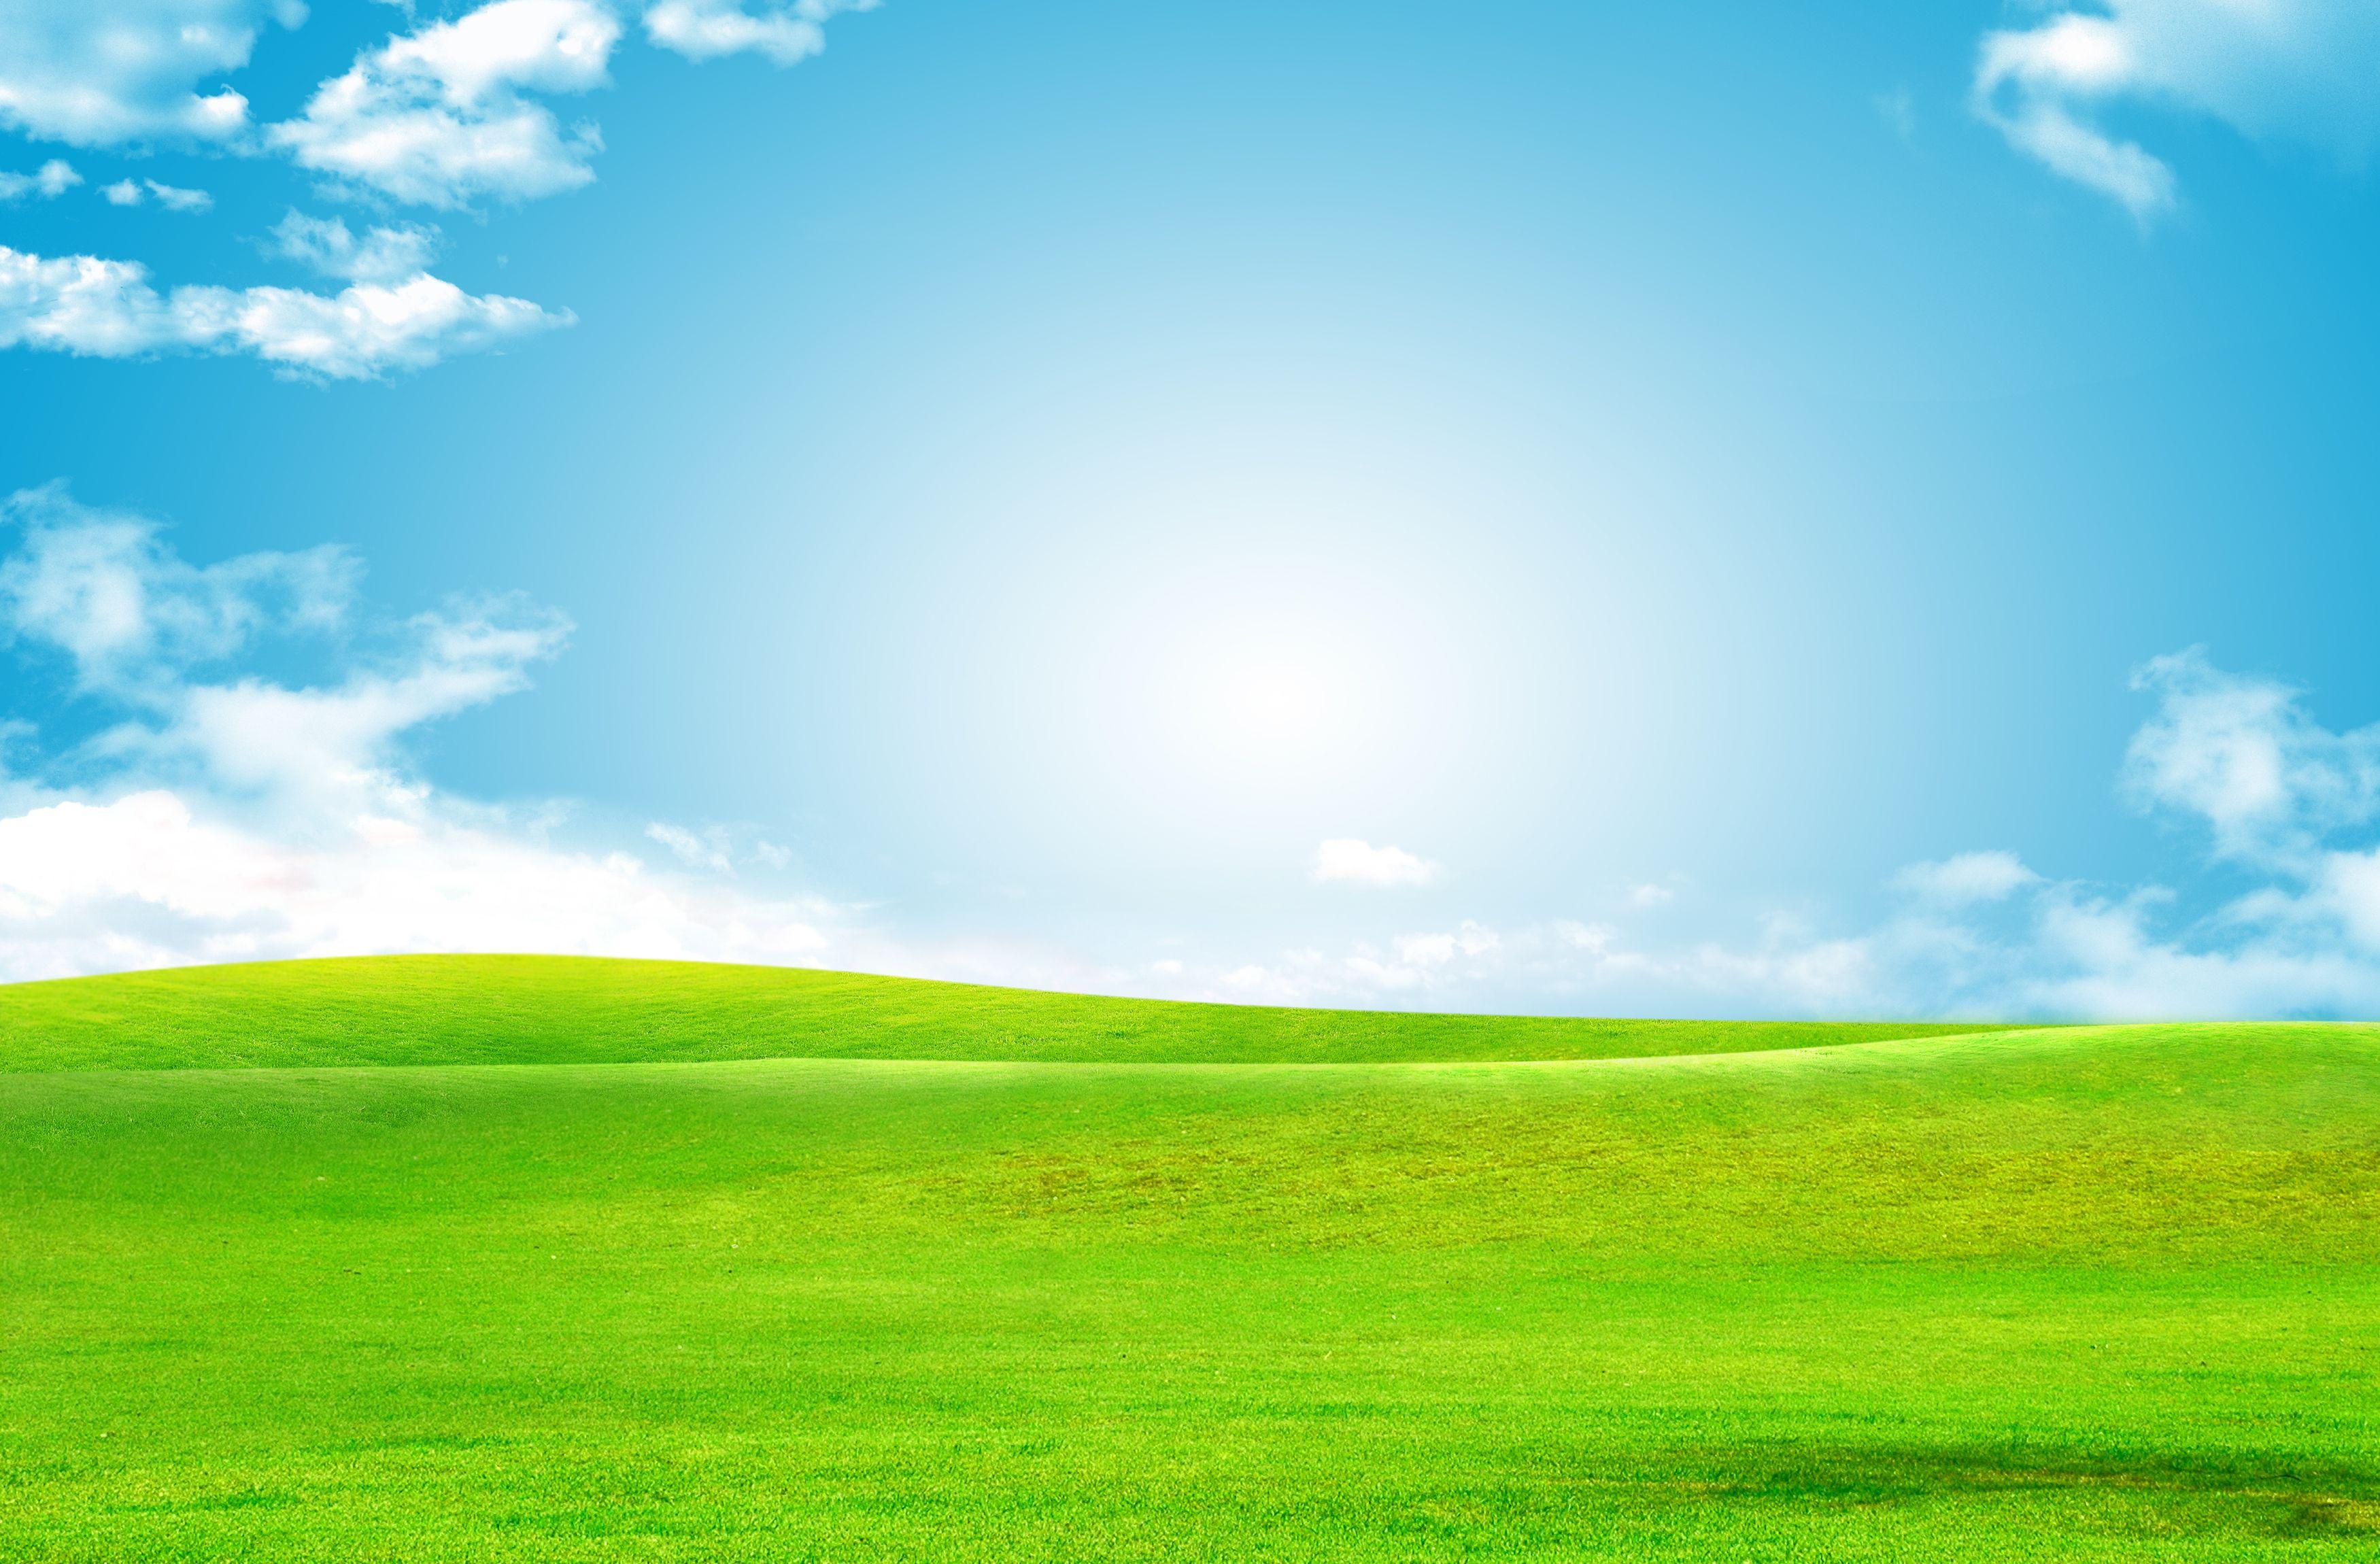 Sky Green Grass Background in 2020 | Grass background, Green grass ...